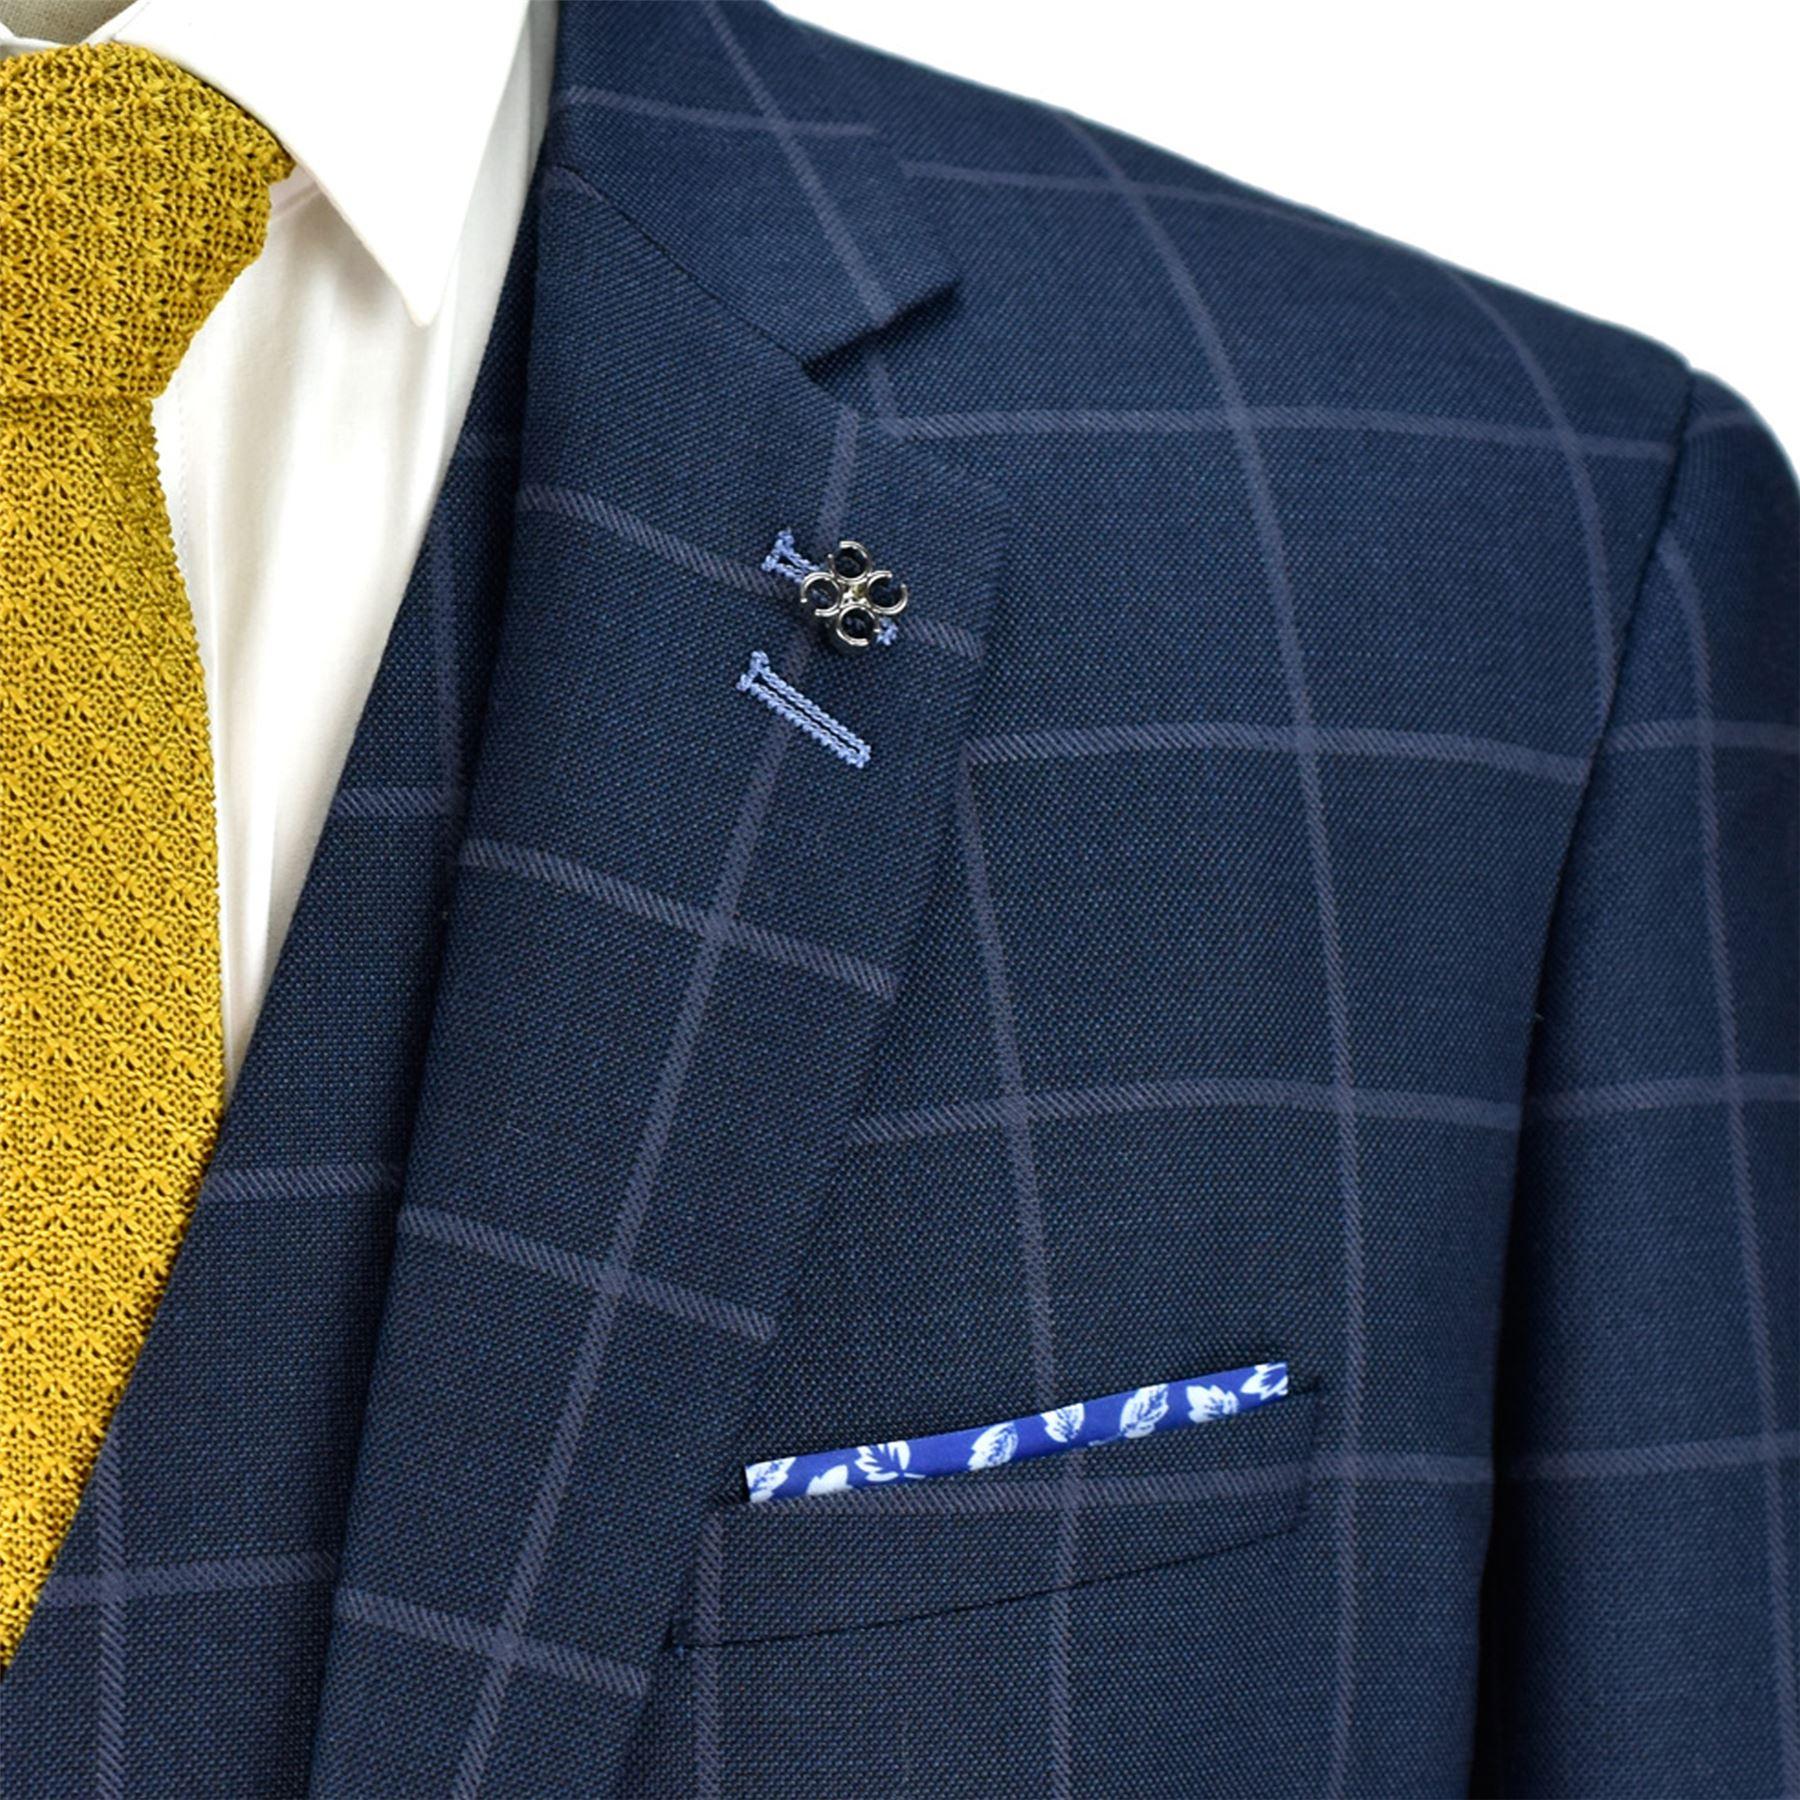 Blazer-Para-Hombre-Cavani-Macy-Boda-Chaleco-Pantalones-3-piezas-traje-se-vende-por-separado miniatura 3